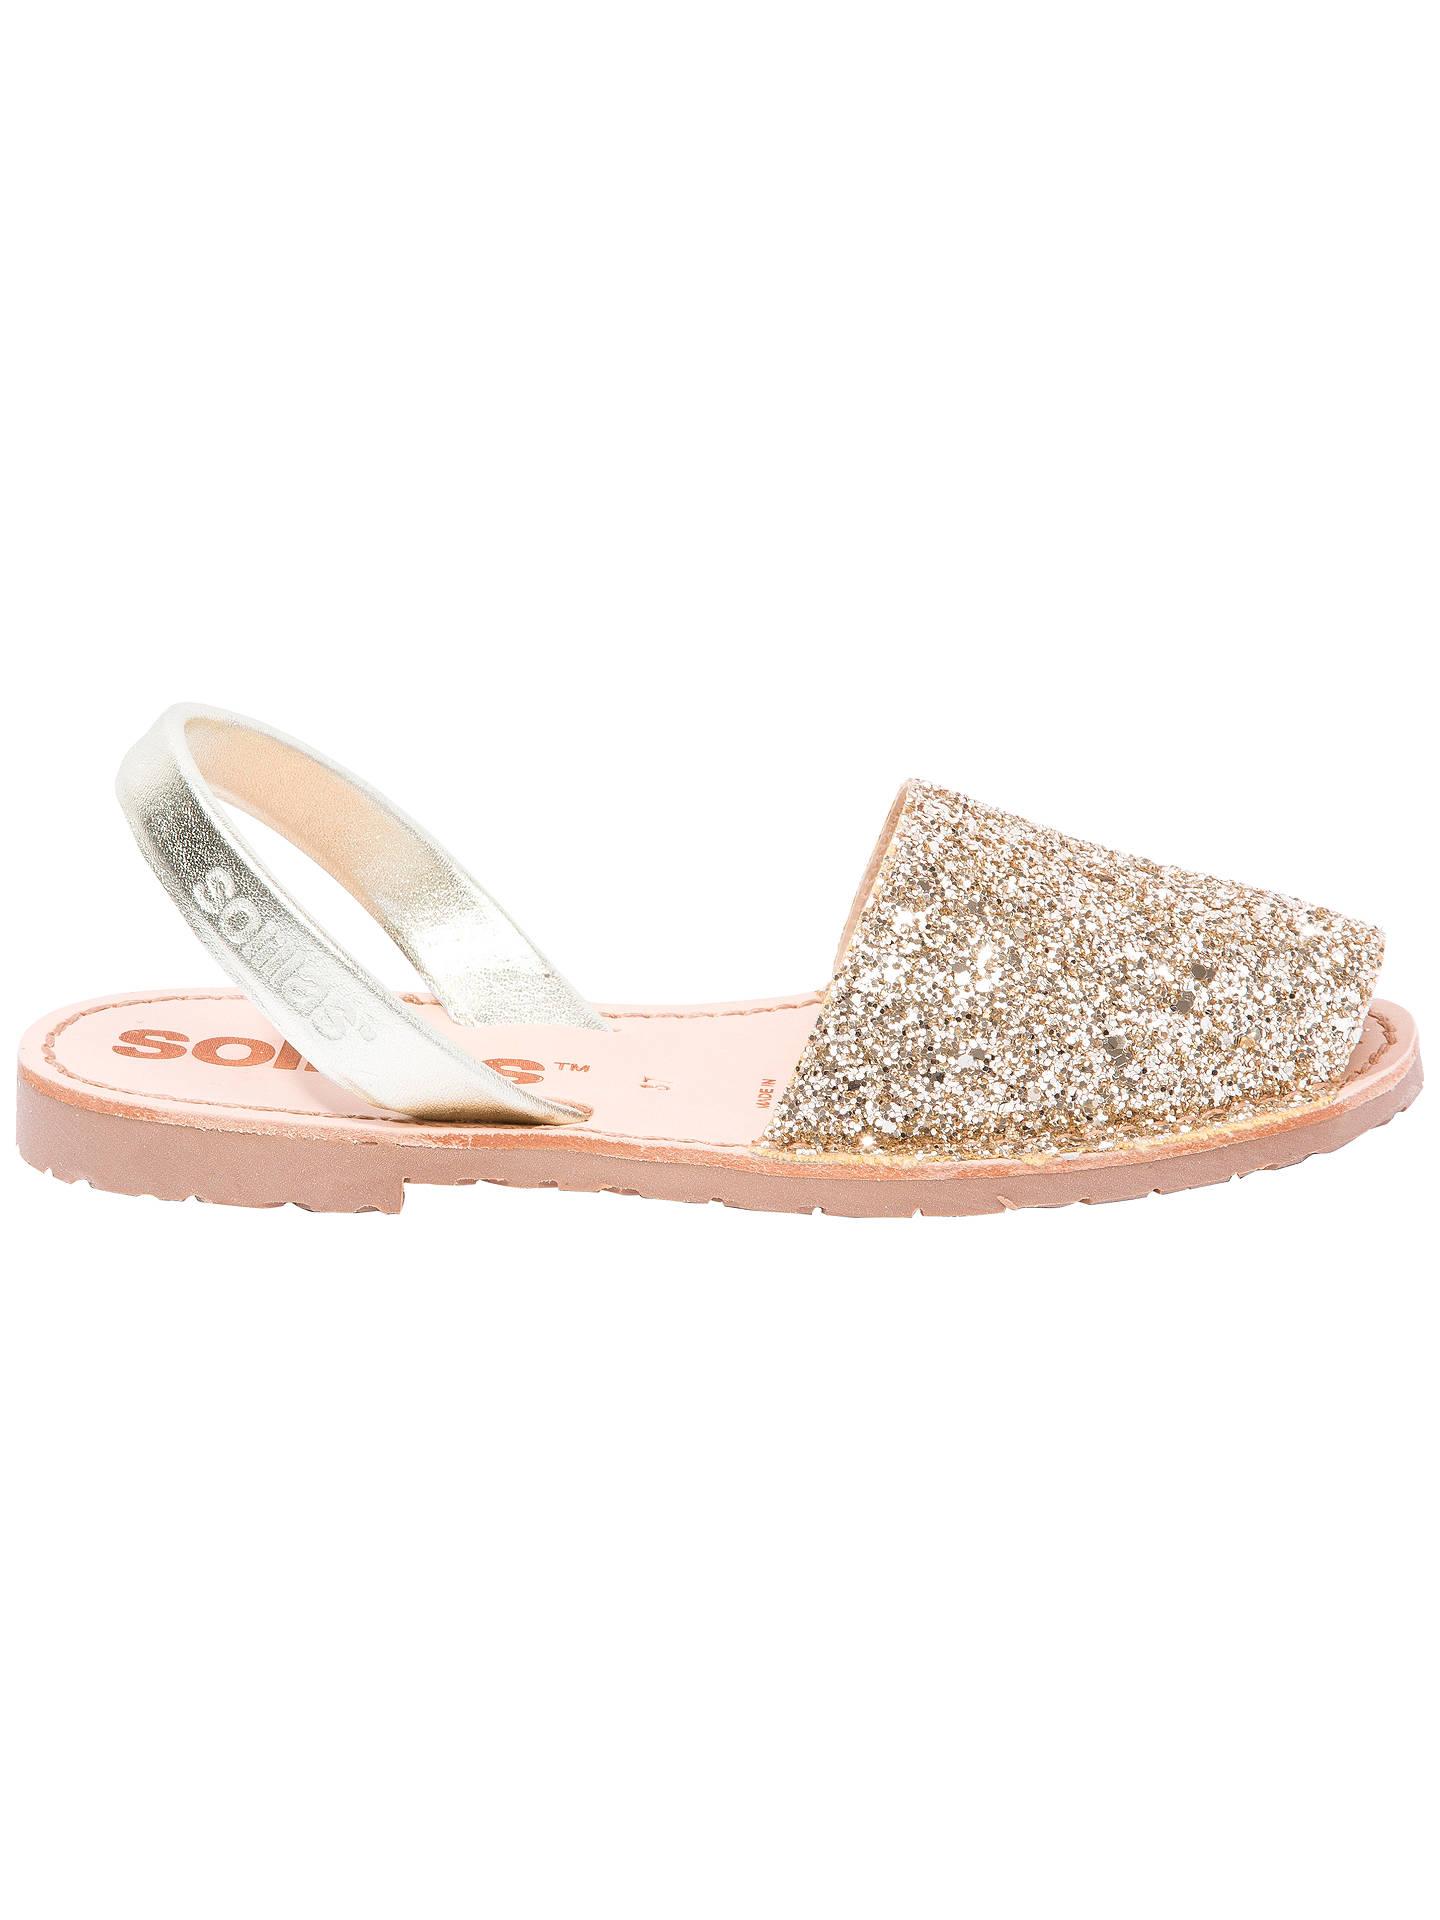 633c240a3 Buy Solillas Original Two Part Sandals